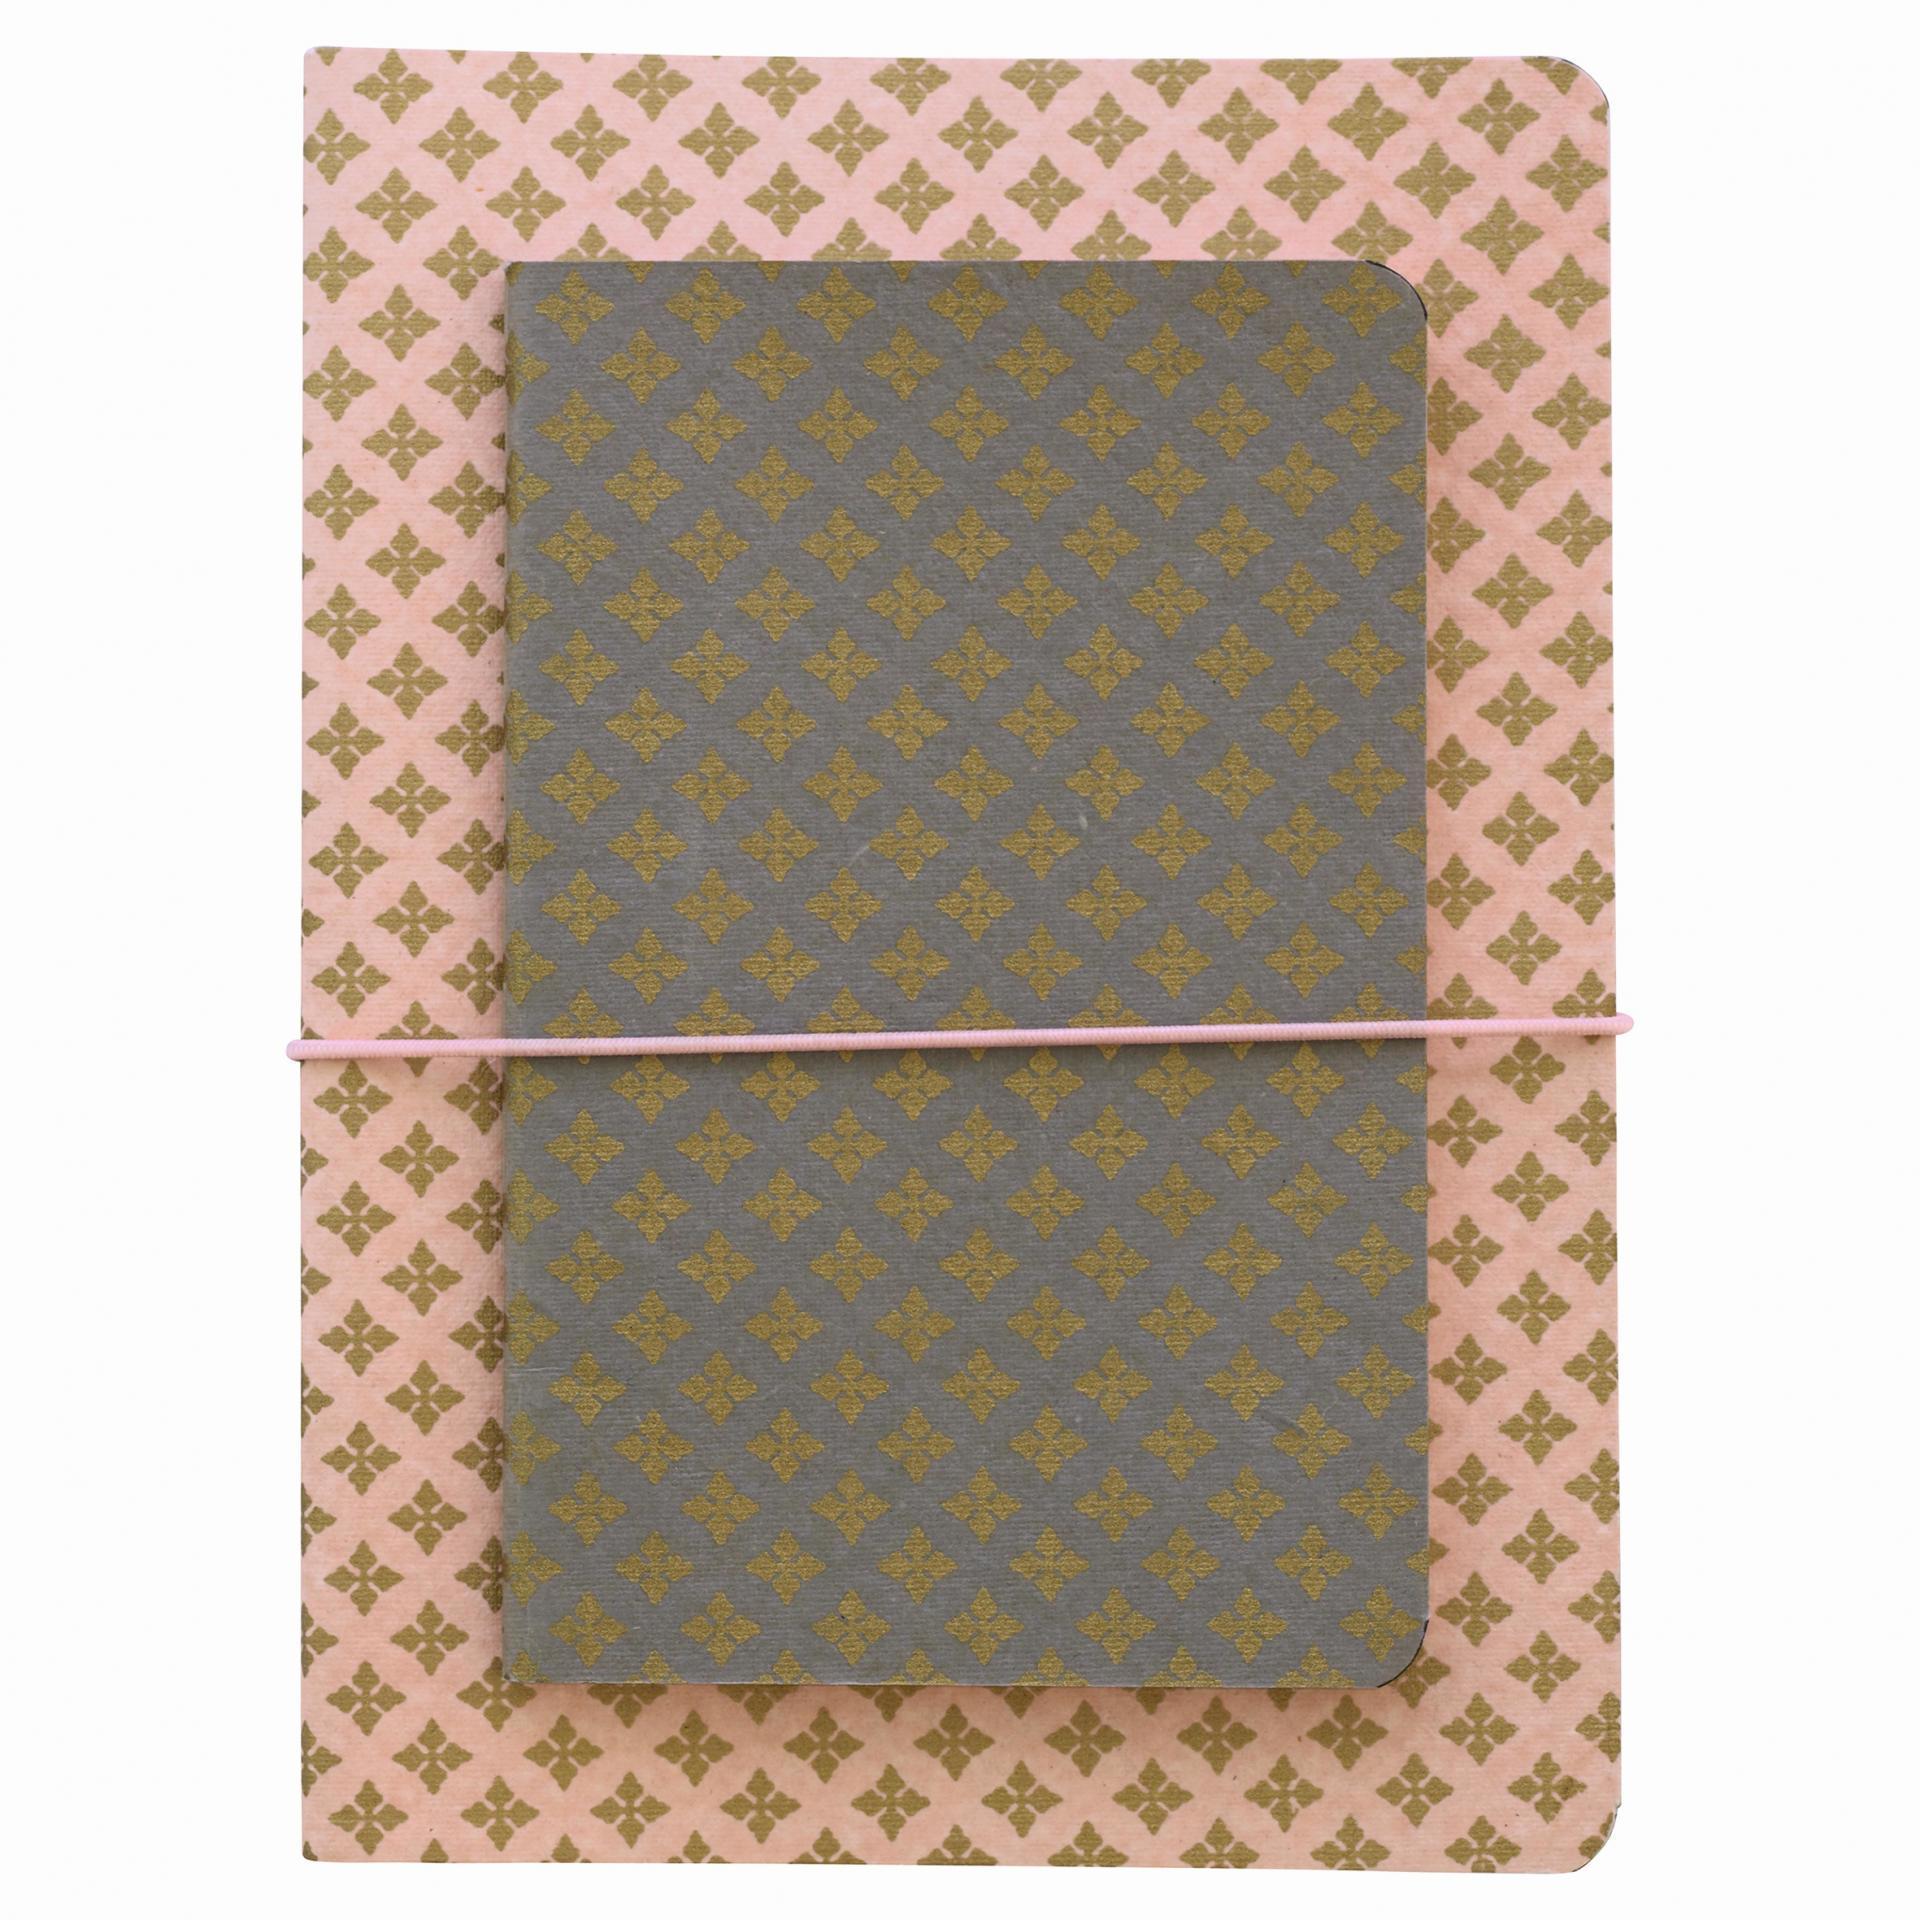 GREEN GATE Papírový sešit Sasha - 2 ks, růžová barva, oranžová barva, šedá barva, zlatá barva, papír